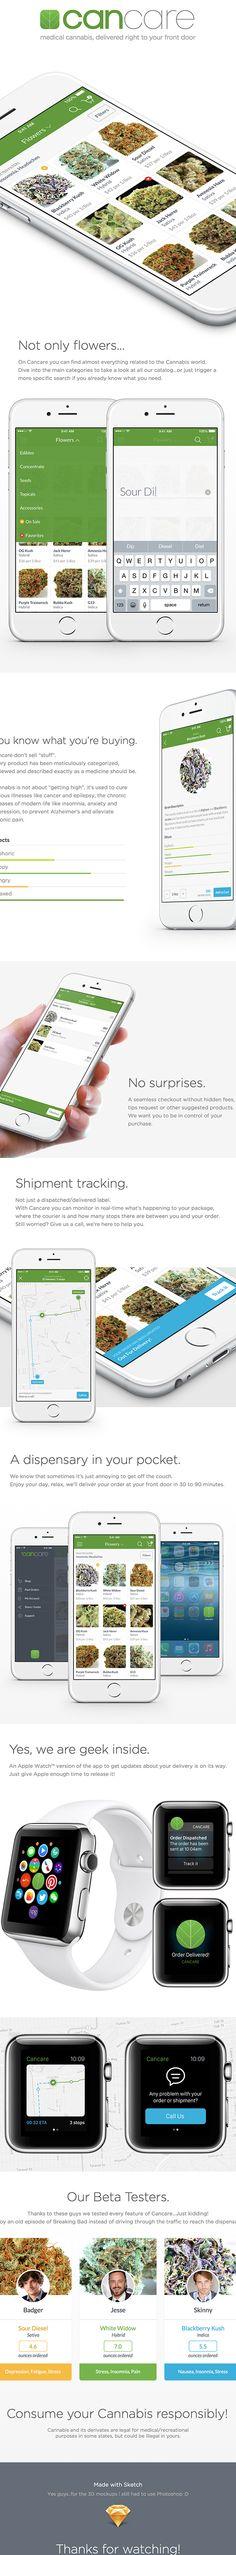 Cancare - Medical Marijuana Delivery App